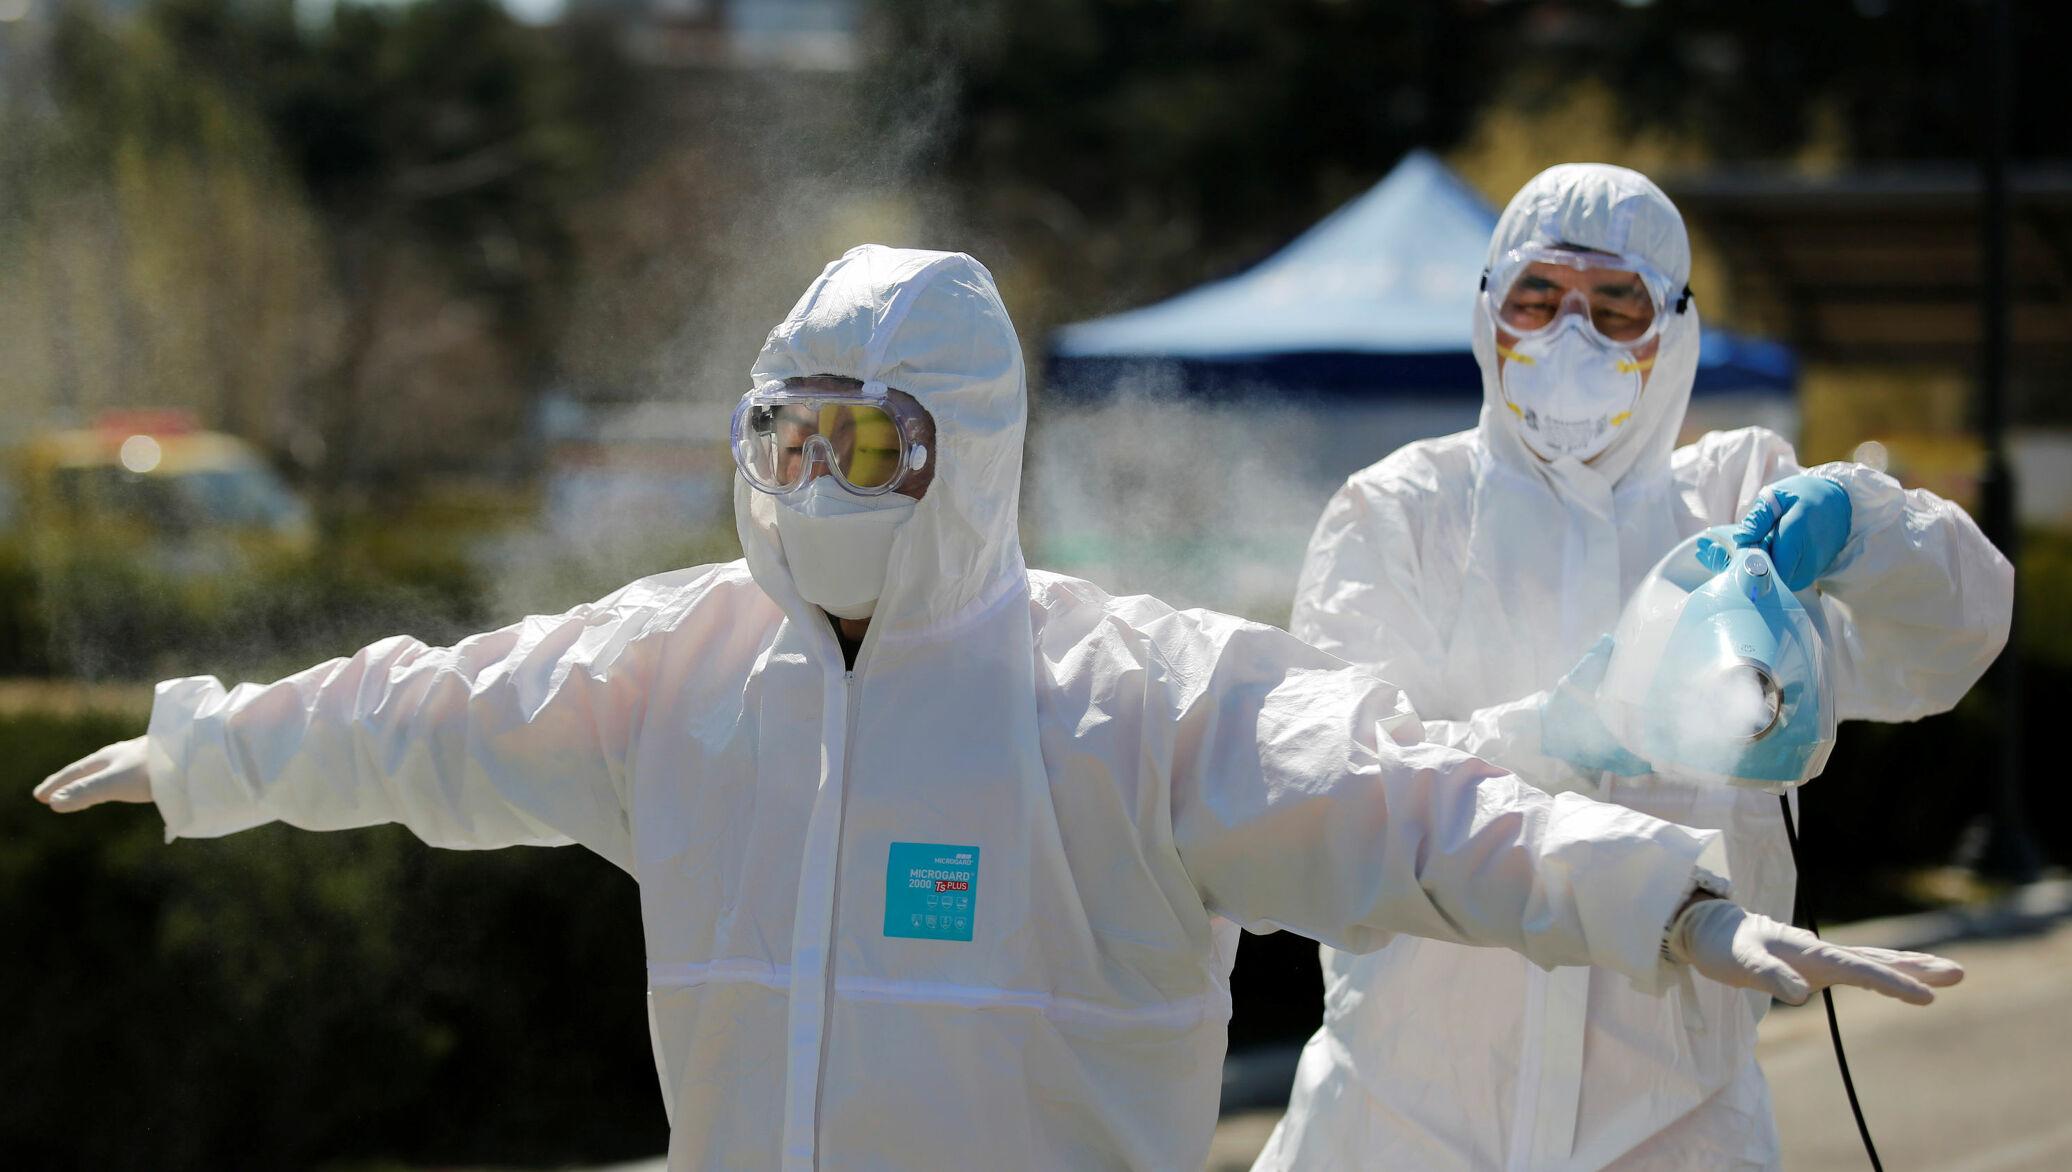 В Узбекистане почти 600 человек заболело коронавирусом — статистика